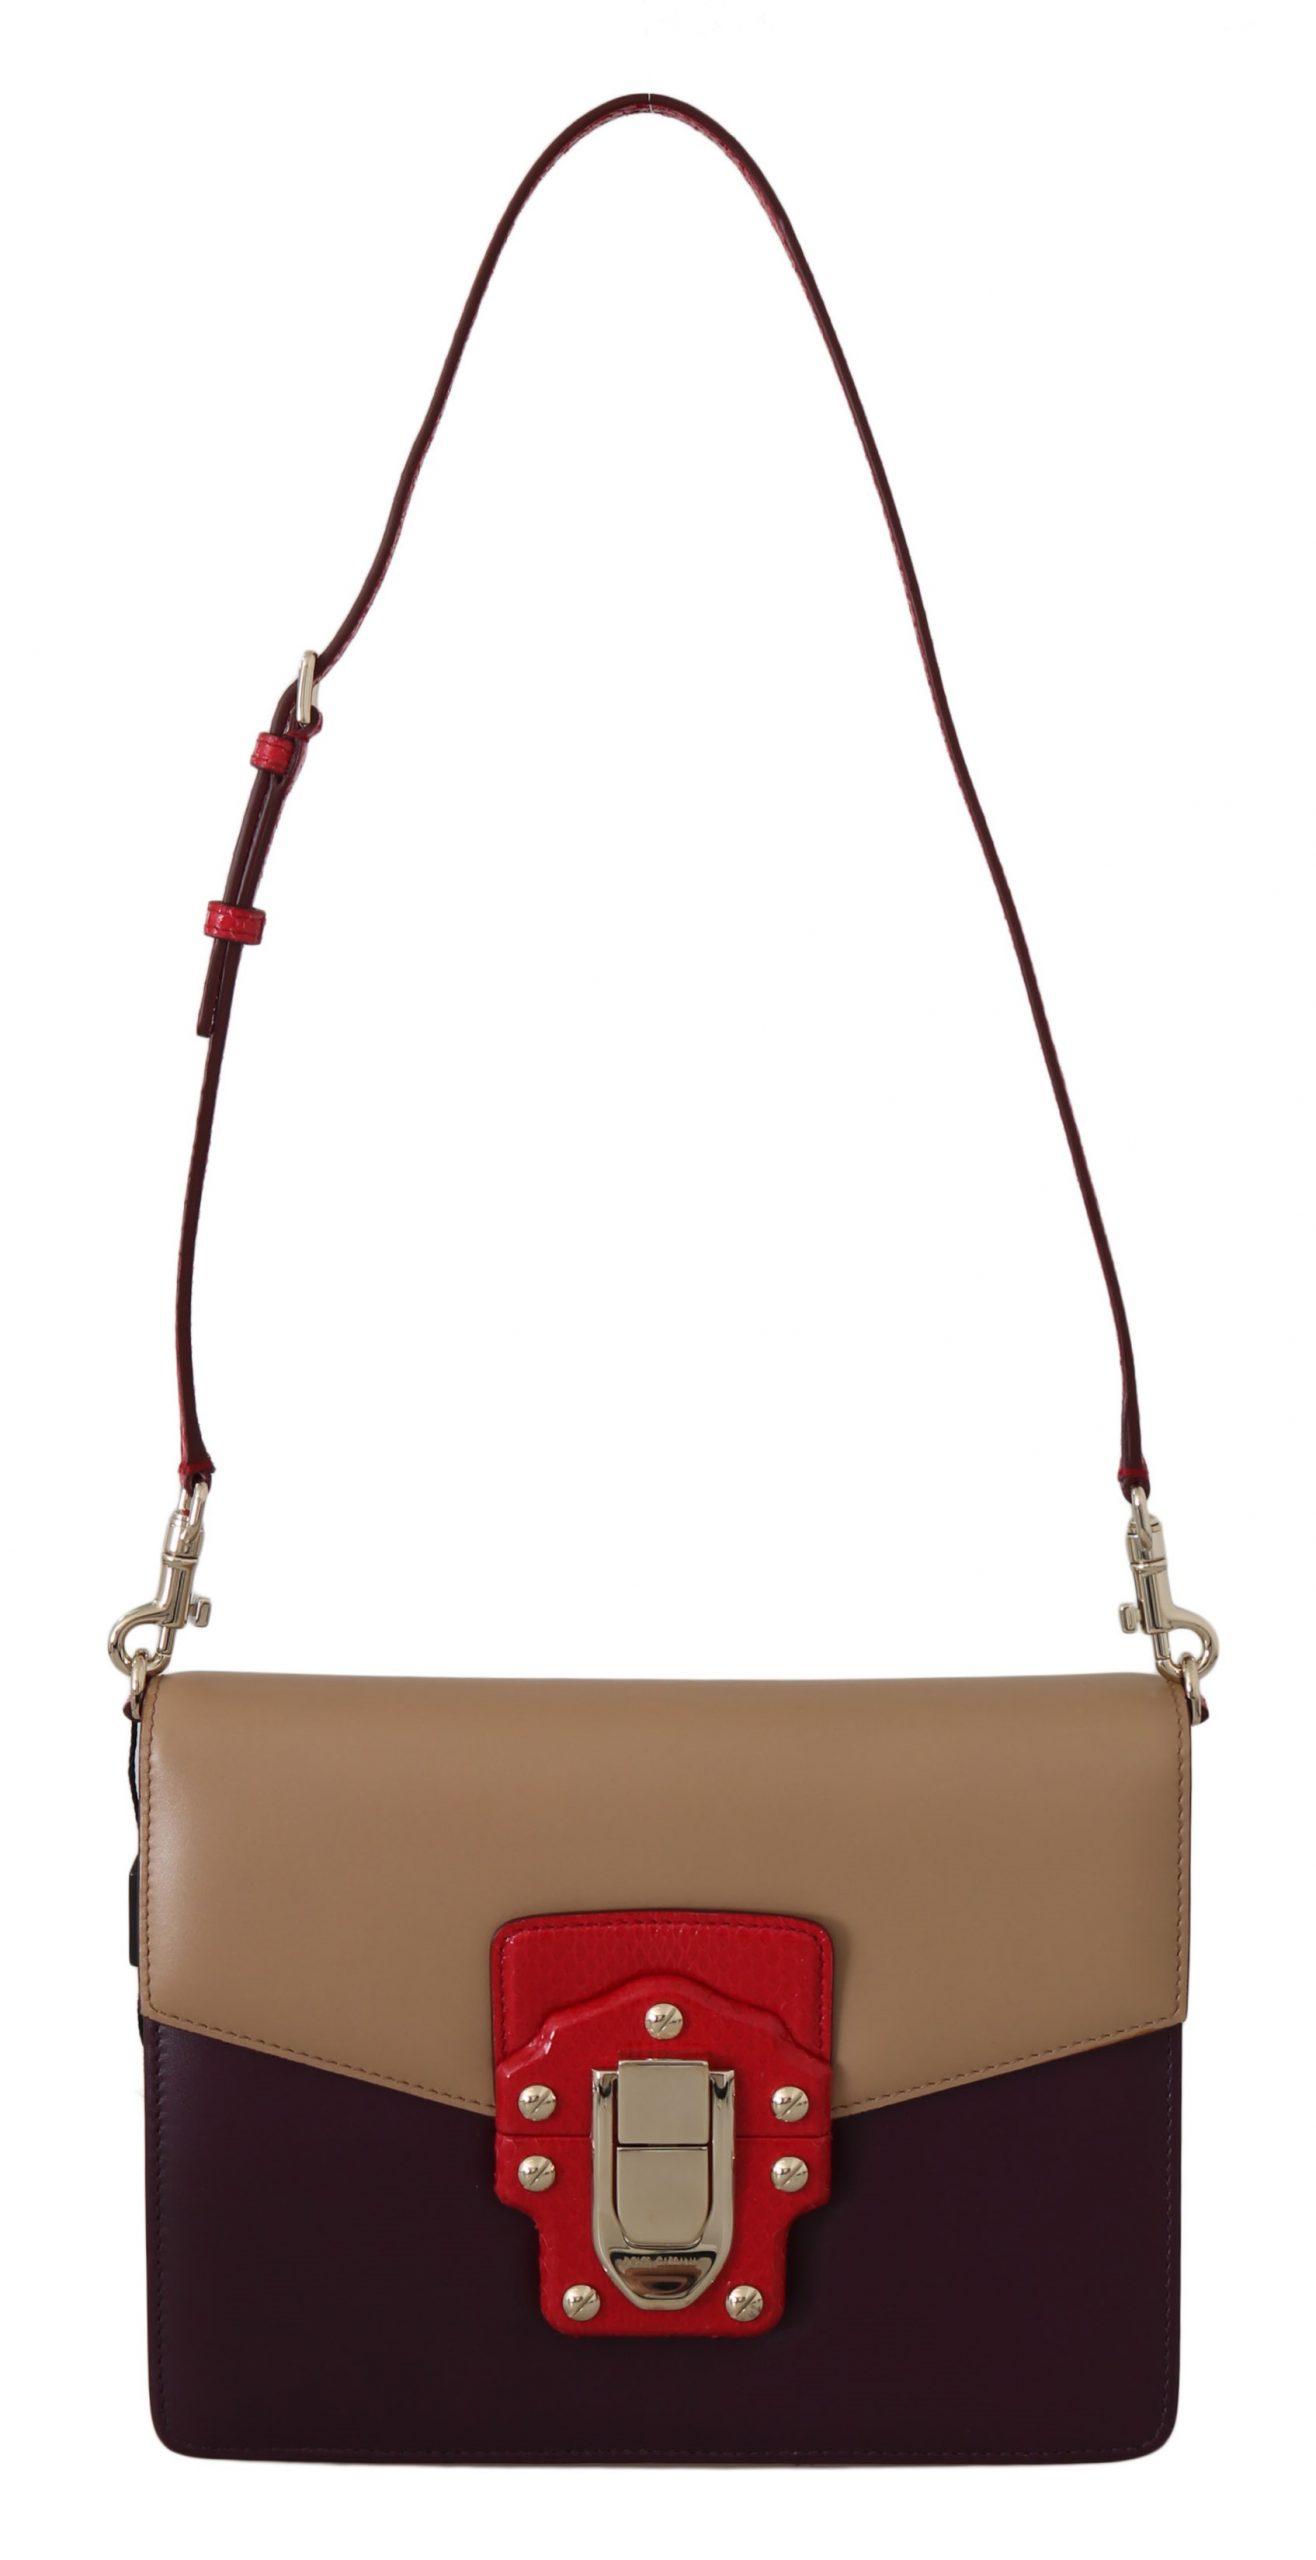 Dolce & Gabbana Women's LUCIA Leather Shoulder Bag Beige VA1022